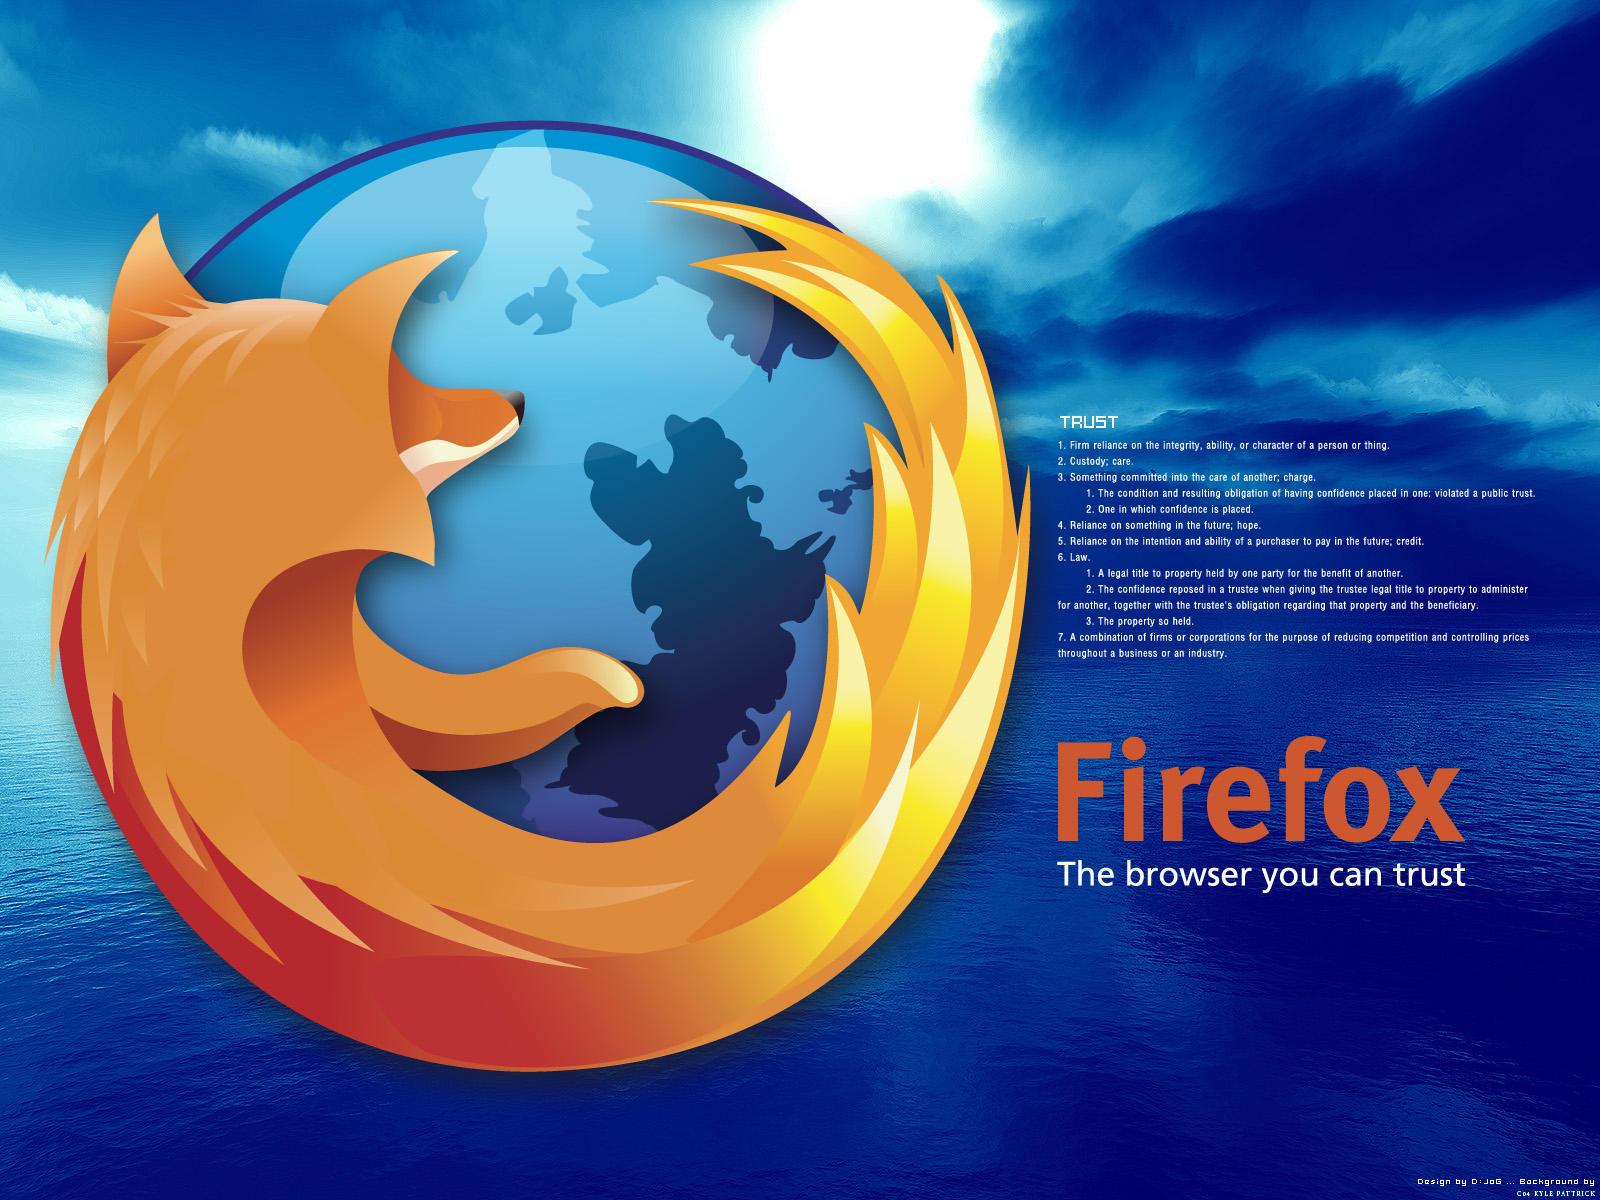 Firefox Trust by djog